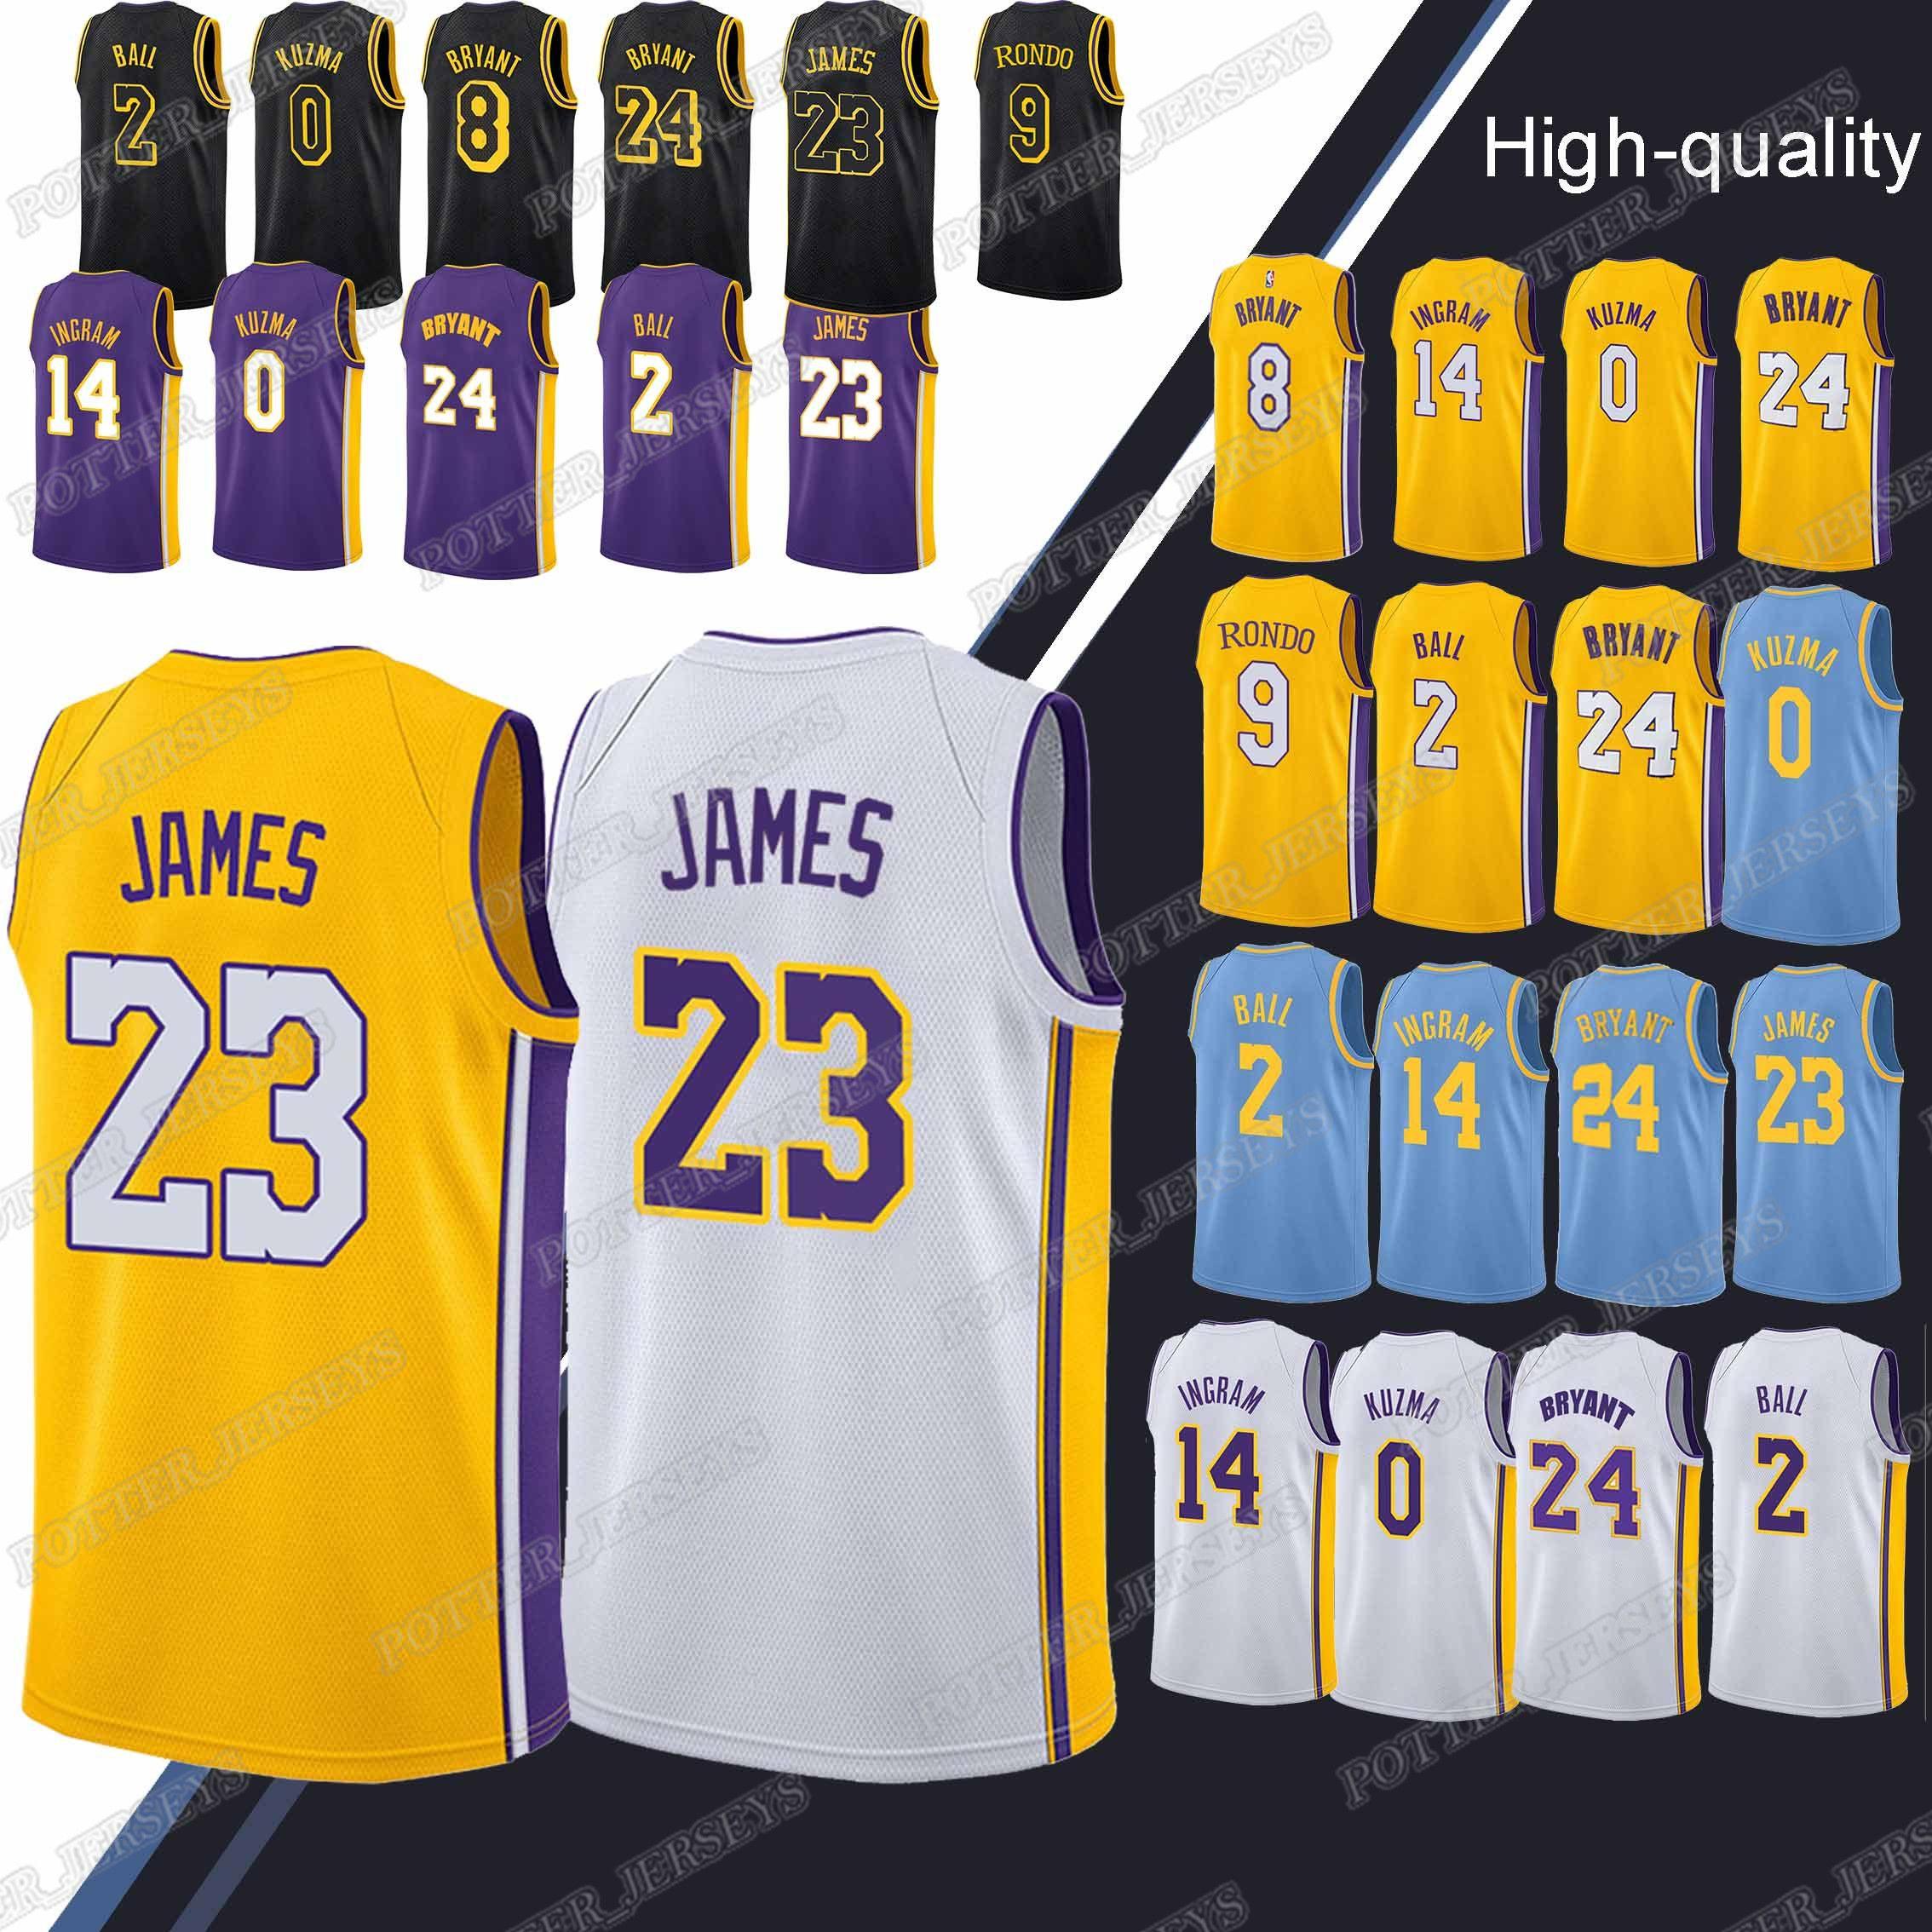 100% authentic 68821 8786a 23 LeBron James Los Angeles jersey Laker 24 Bryant 0 Kuzma 2 Ball Hot sale  2019 menbasketball jerseys